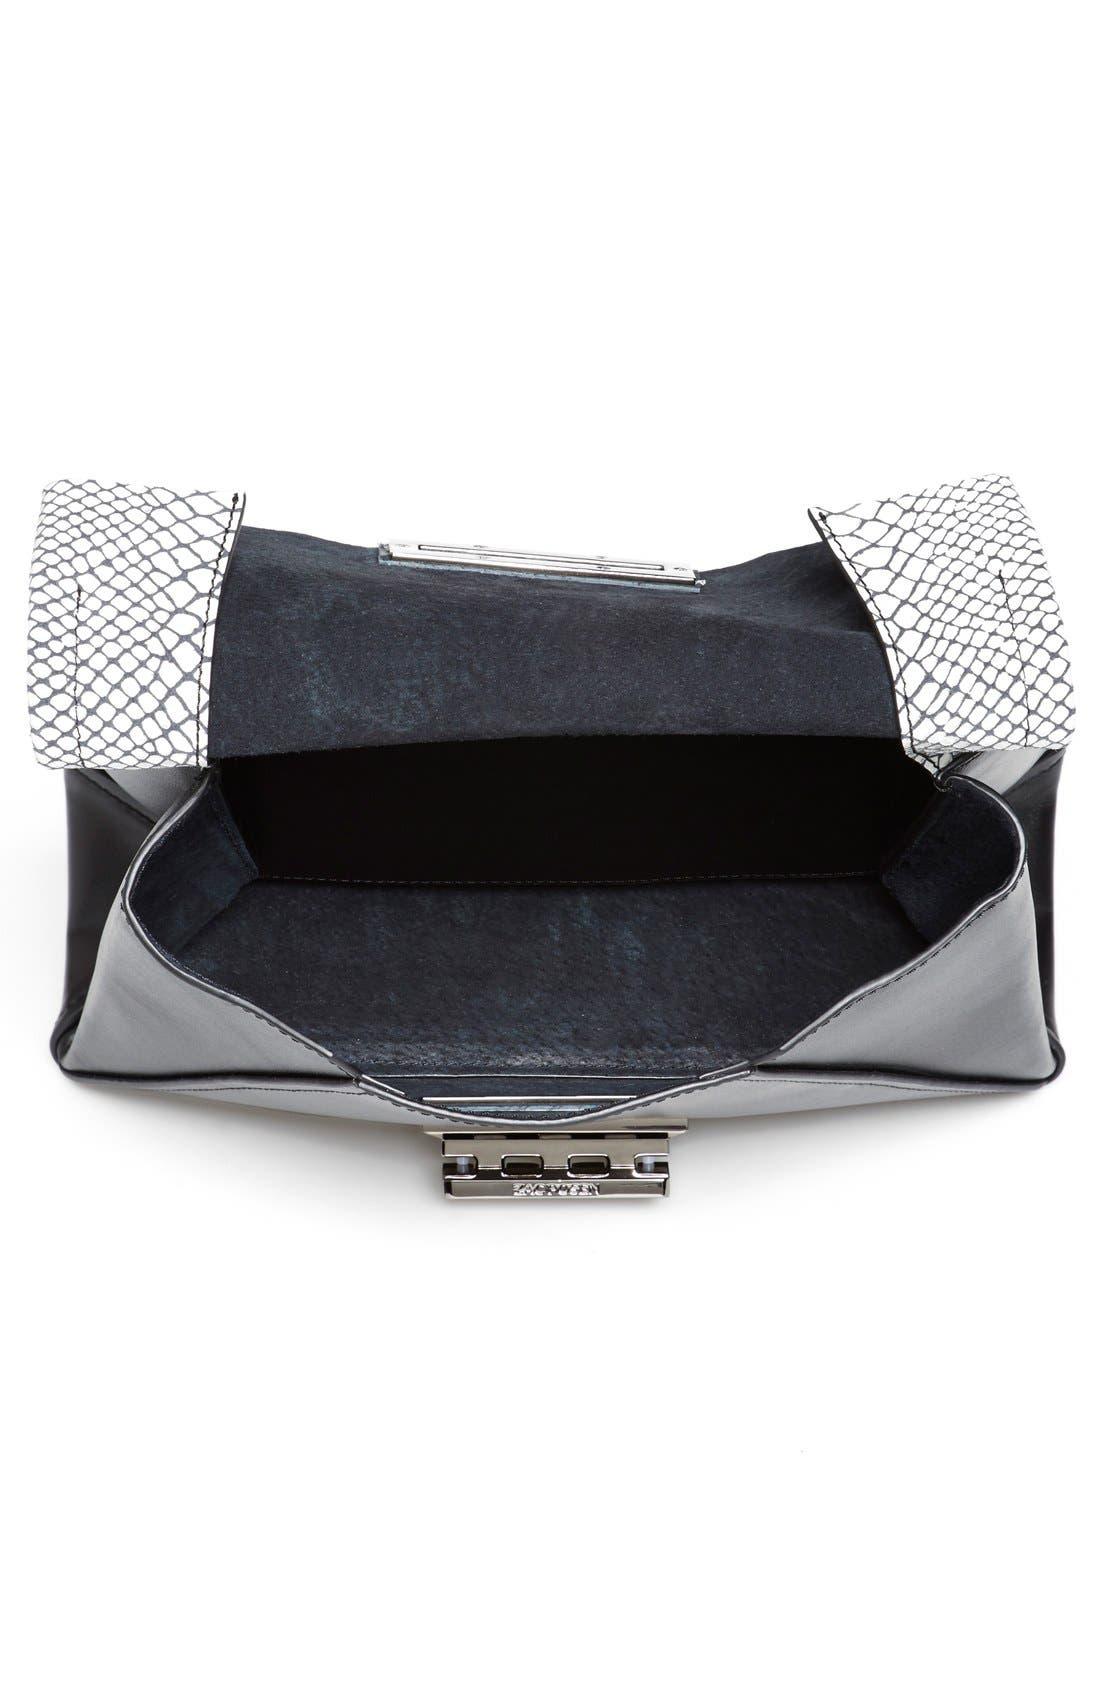 Alternate Image 3  - ZAC Zac Posen 'Eartha' Envelope Flap Shoulder Bag